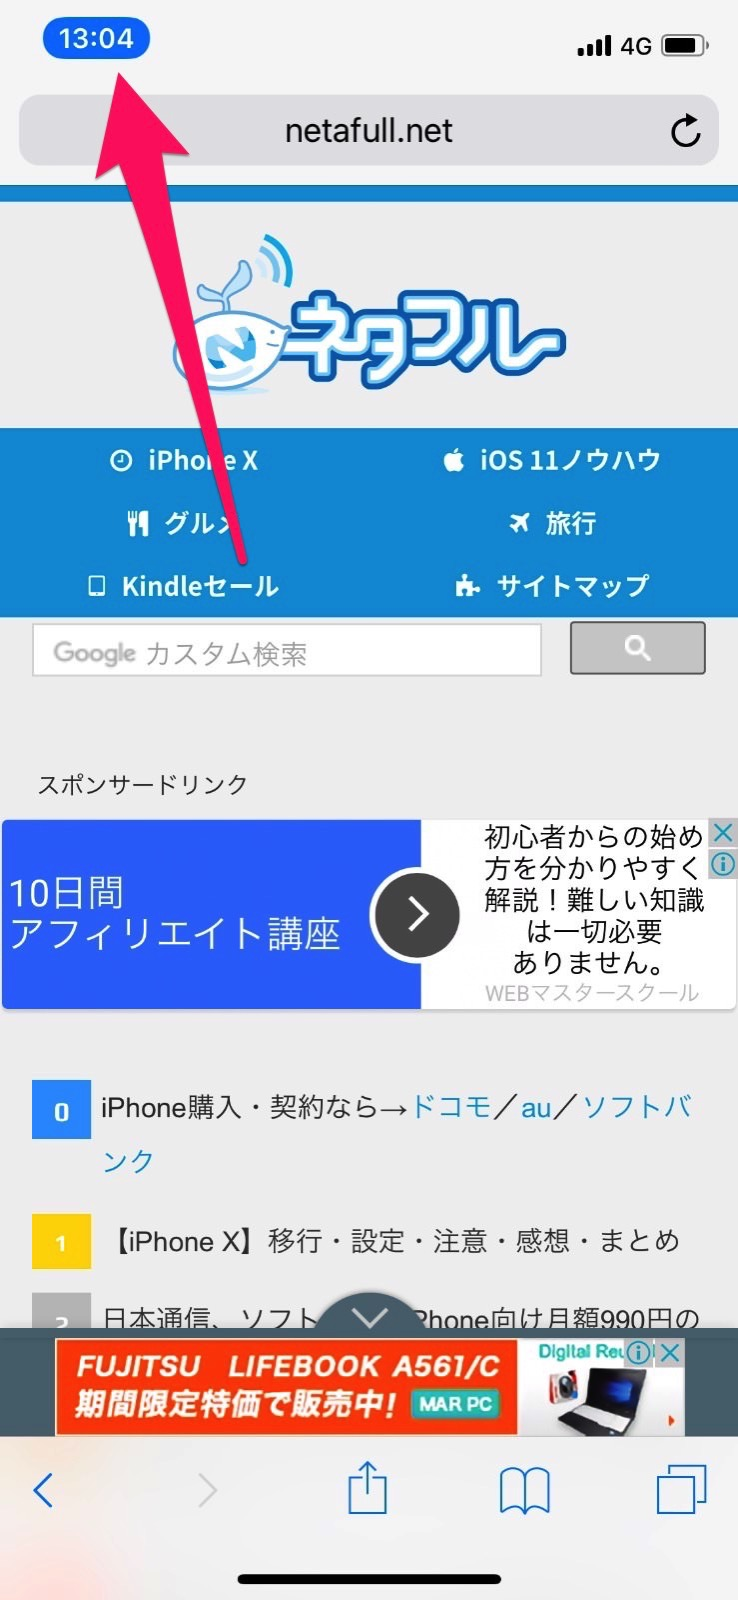 Iphone x tethering 0573